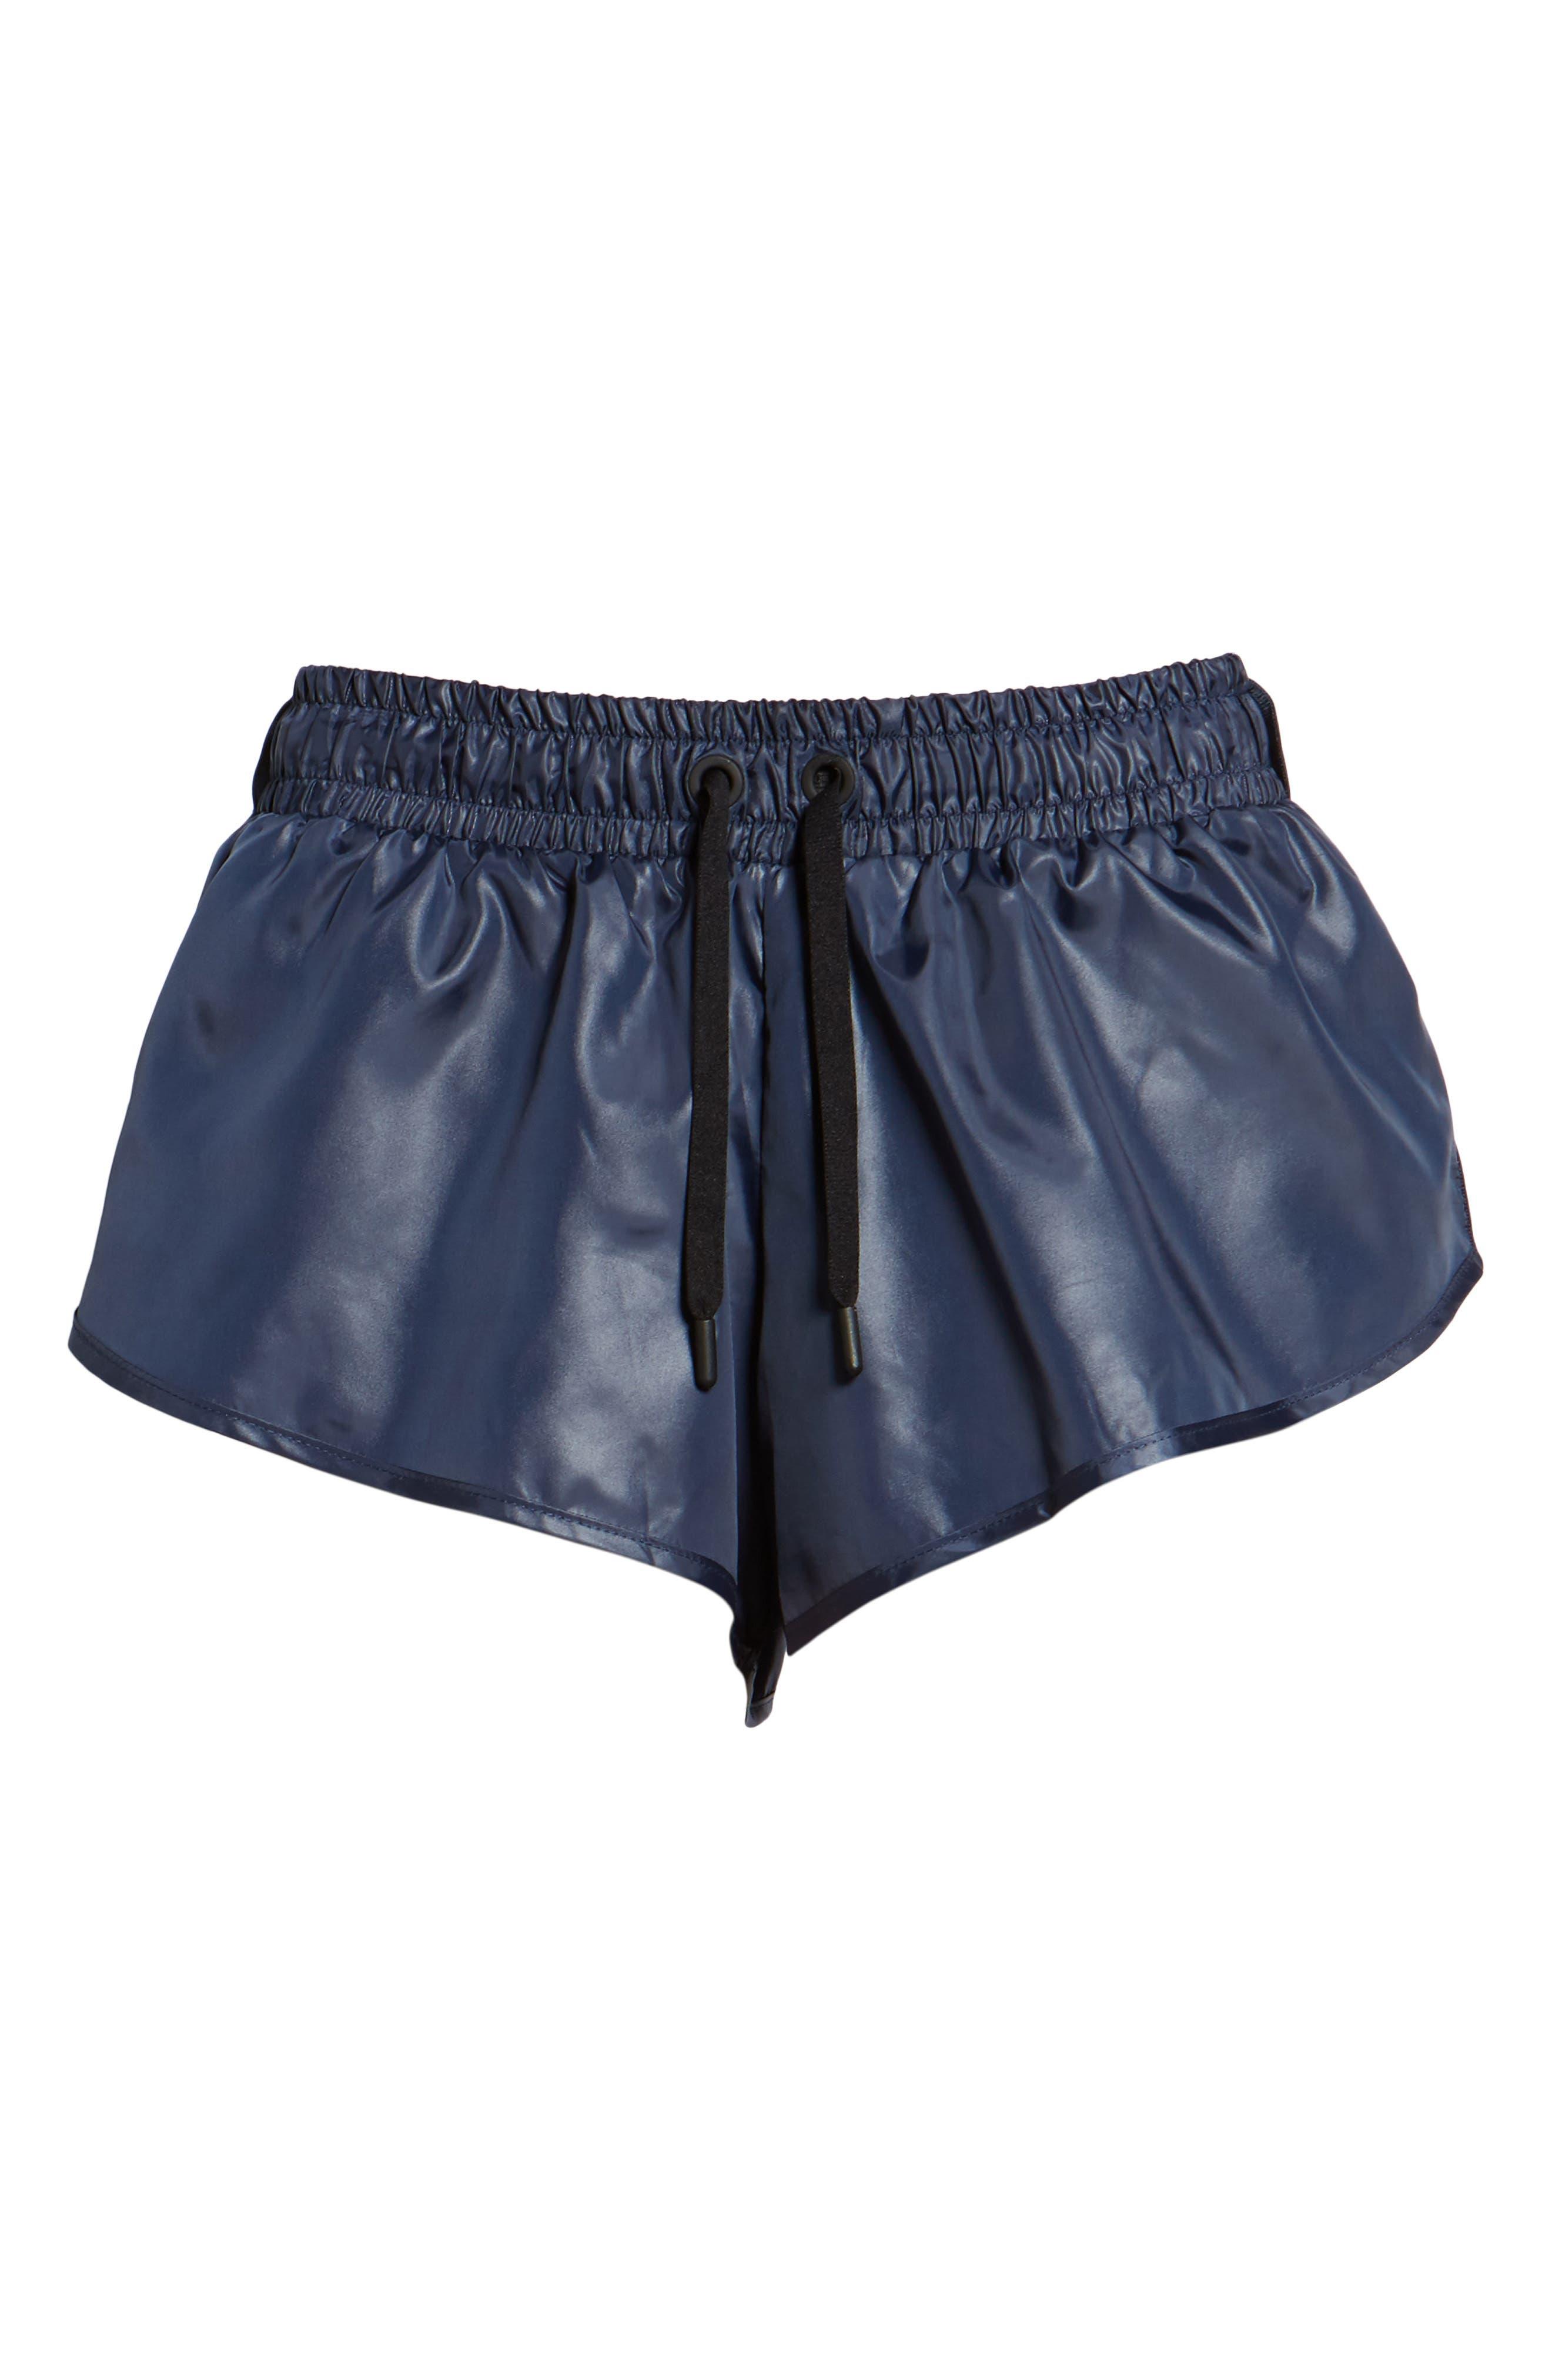 Wetlook Running Shorts,                             Alternate thumbnail 7, color,                             Rainstorm